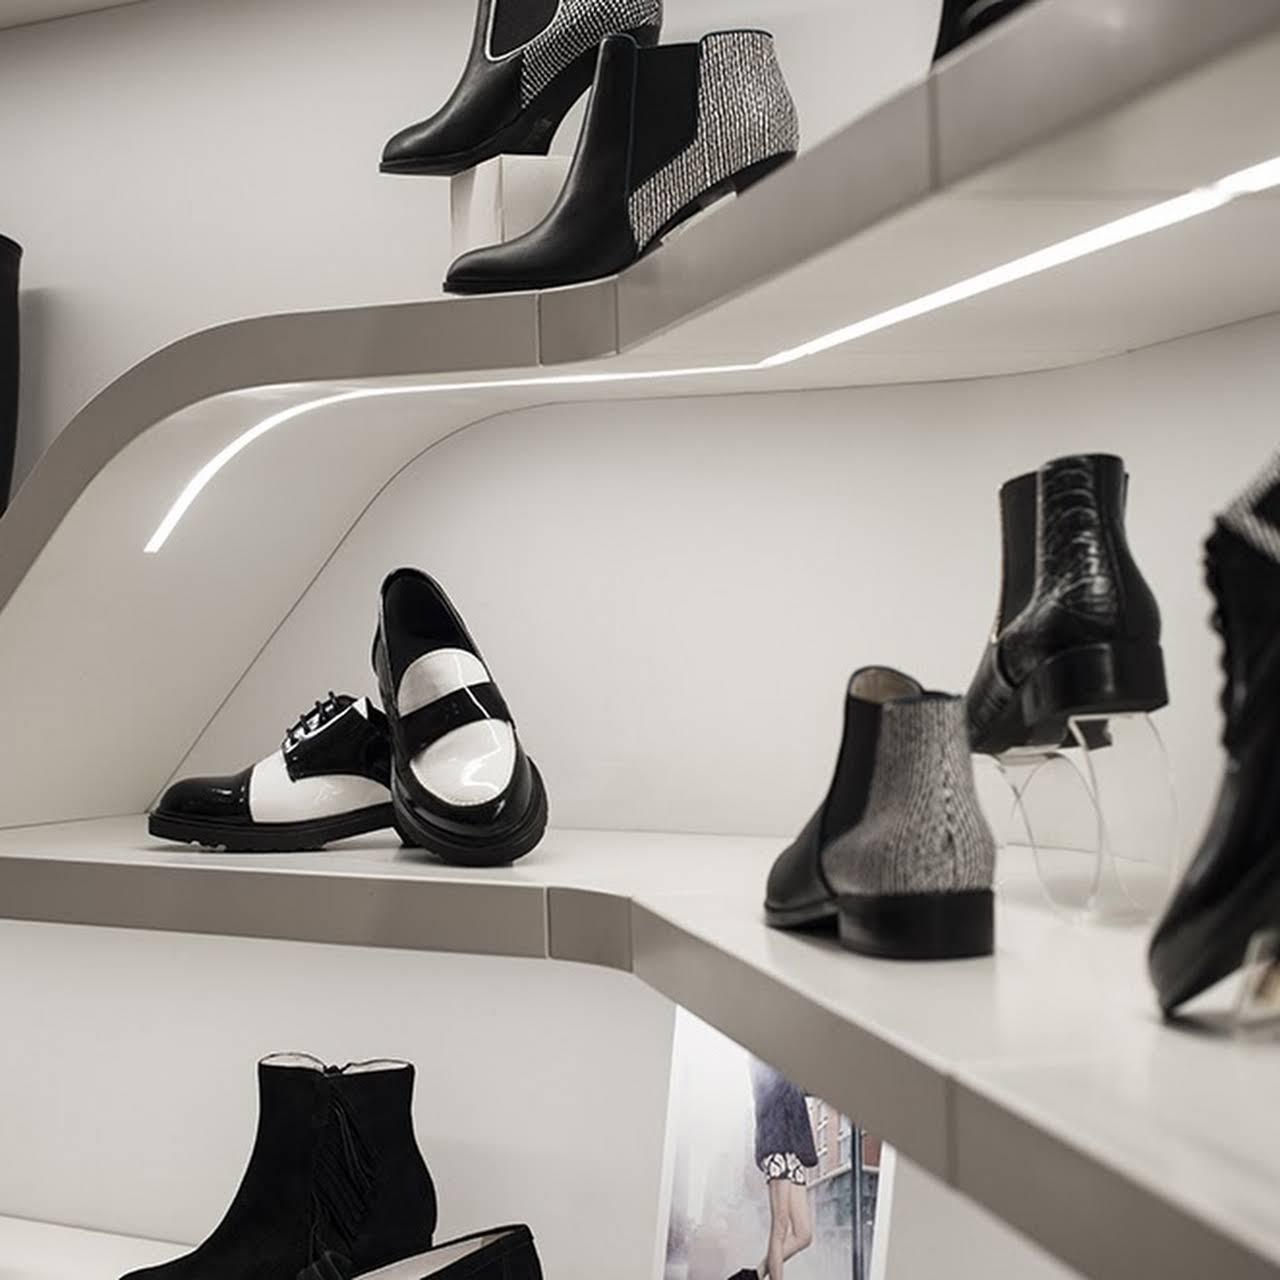 1fee1a8459e2ad Guzzi - Magasin de chaussures à Nantes Beaulieu